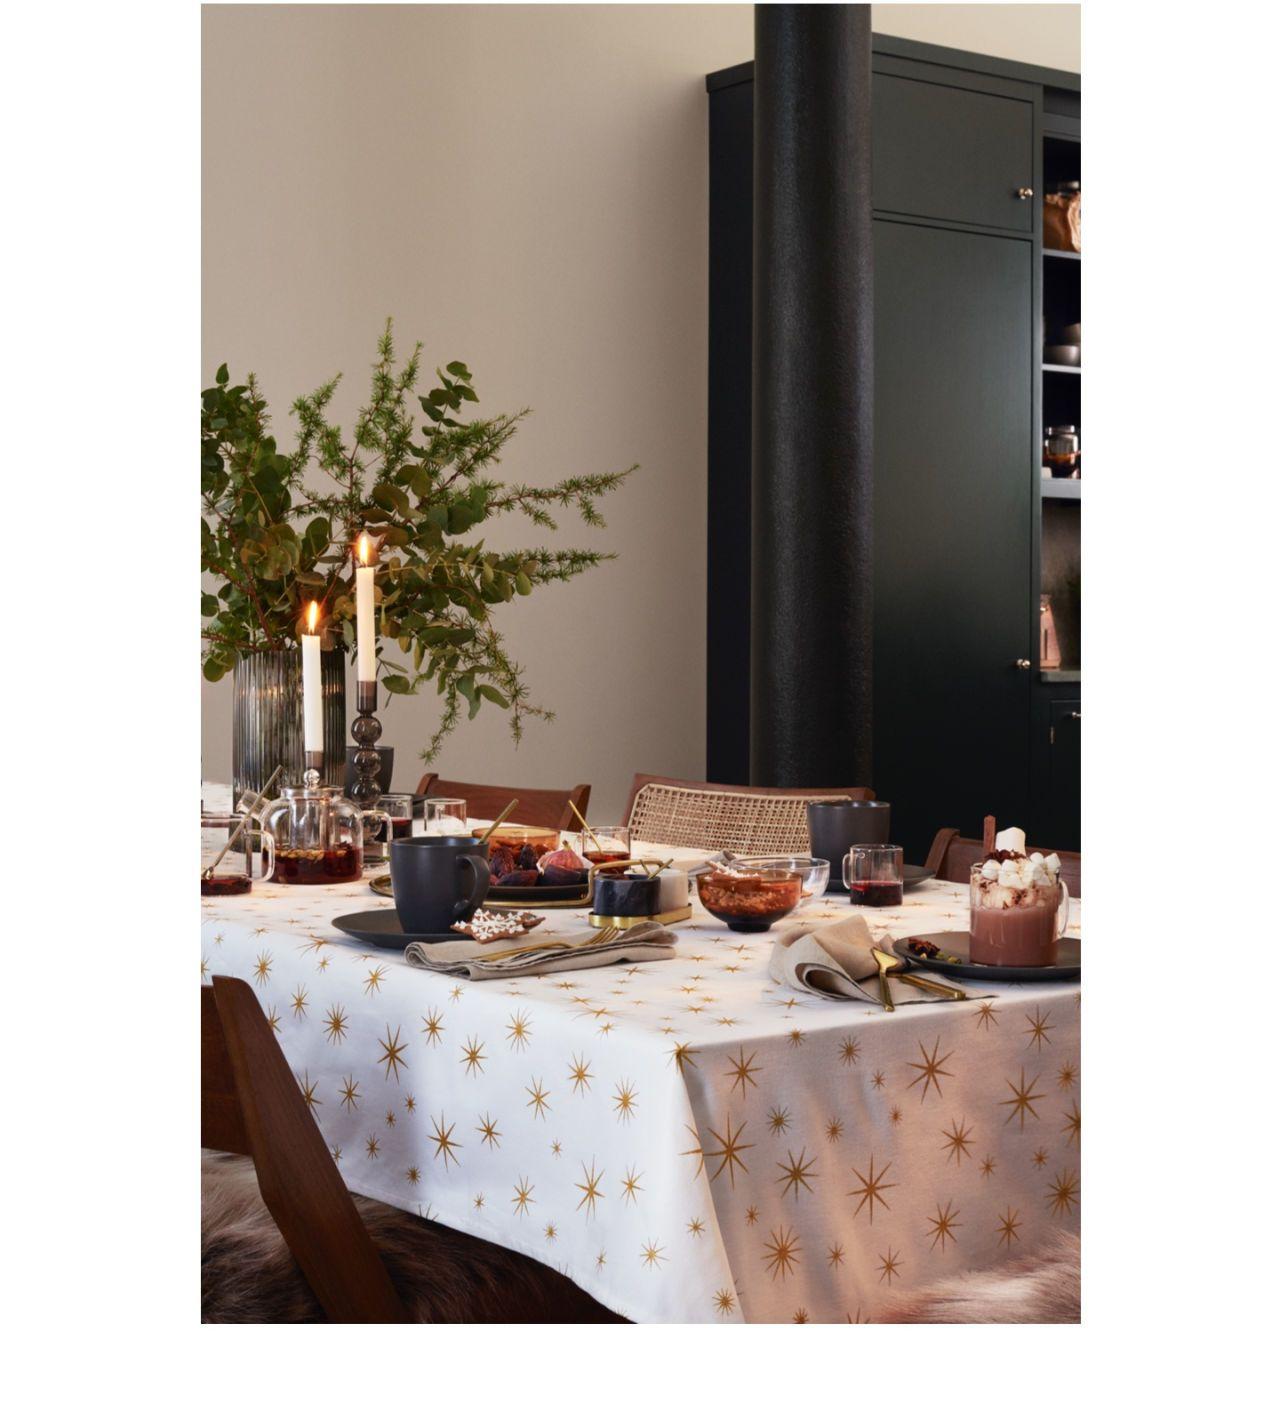 Warm Minimalism H M Home Winter Table Christmas Decor Diy